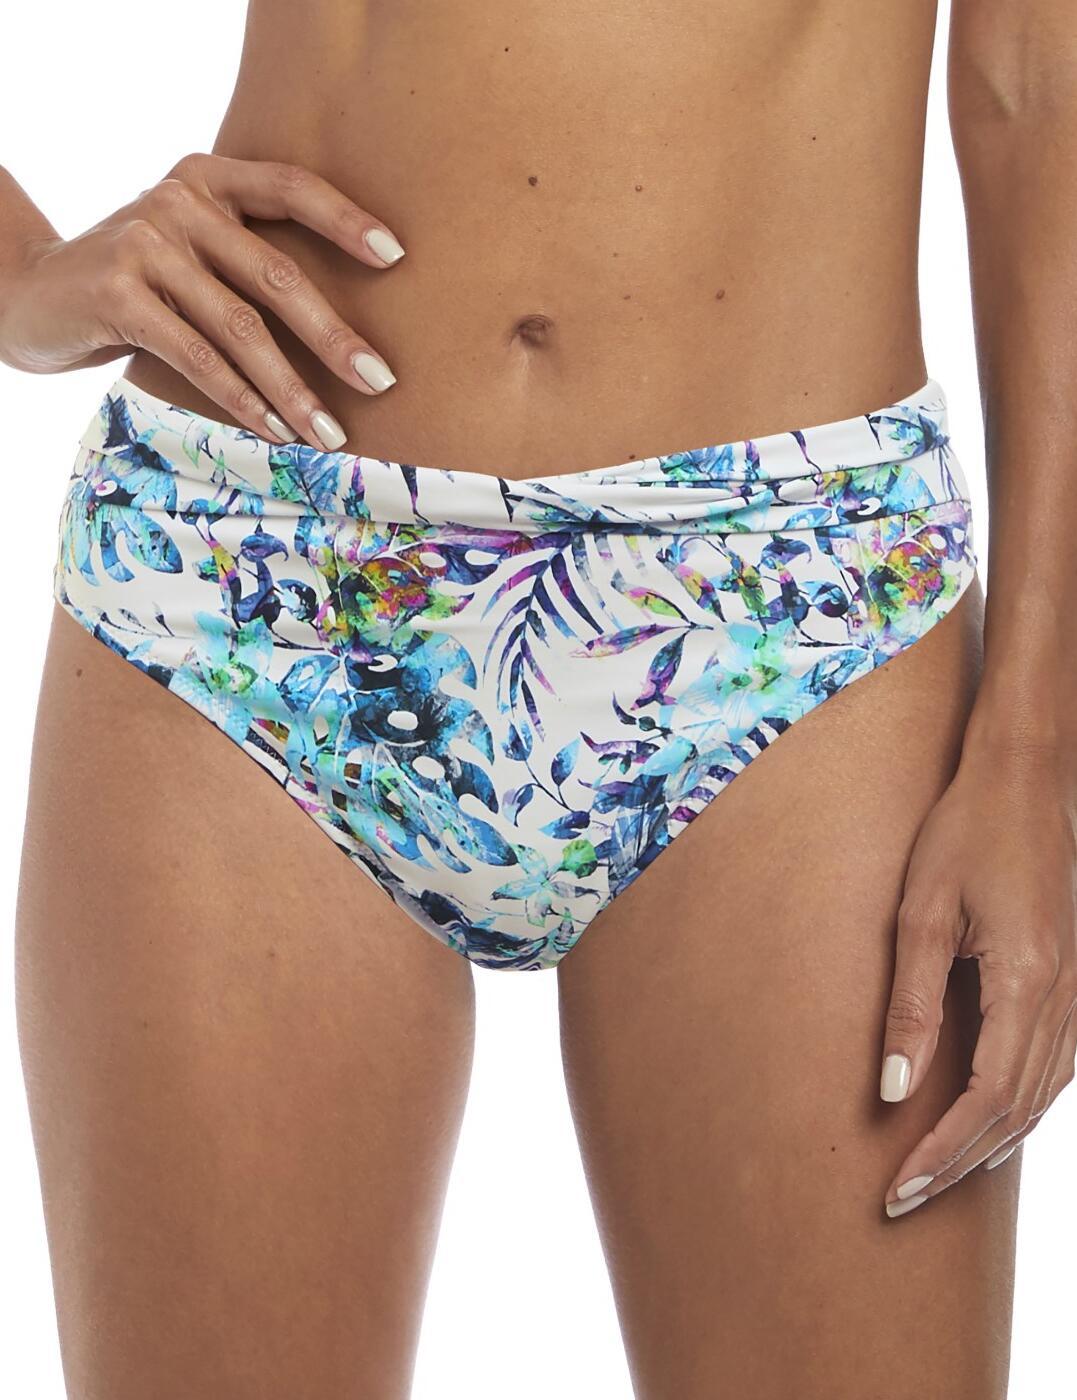 6543 Fantasie Fiji Classic Twist Bikini Brief  - 6543 Multi